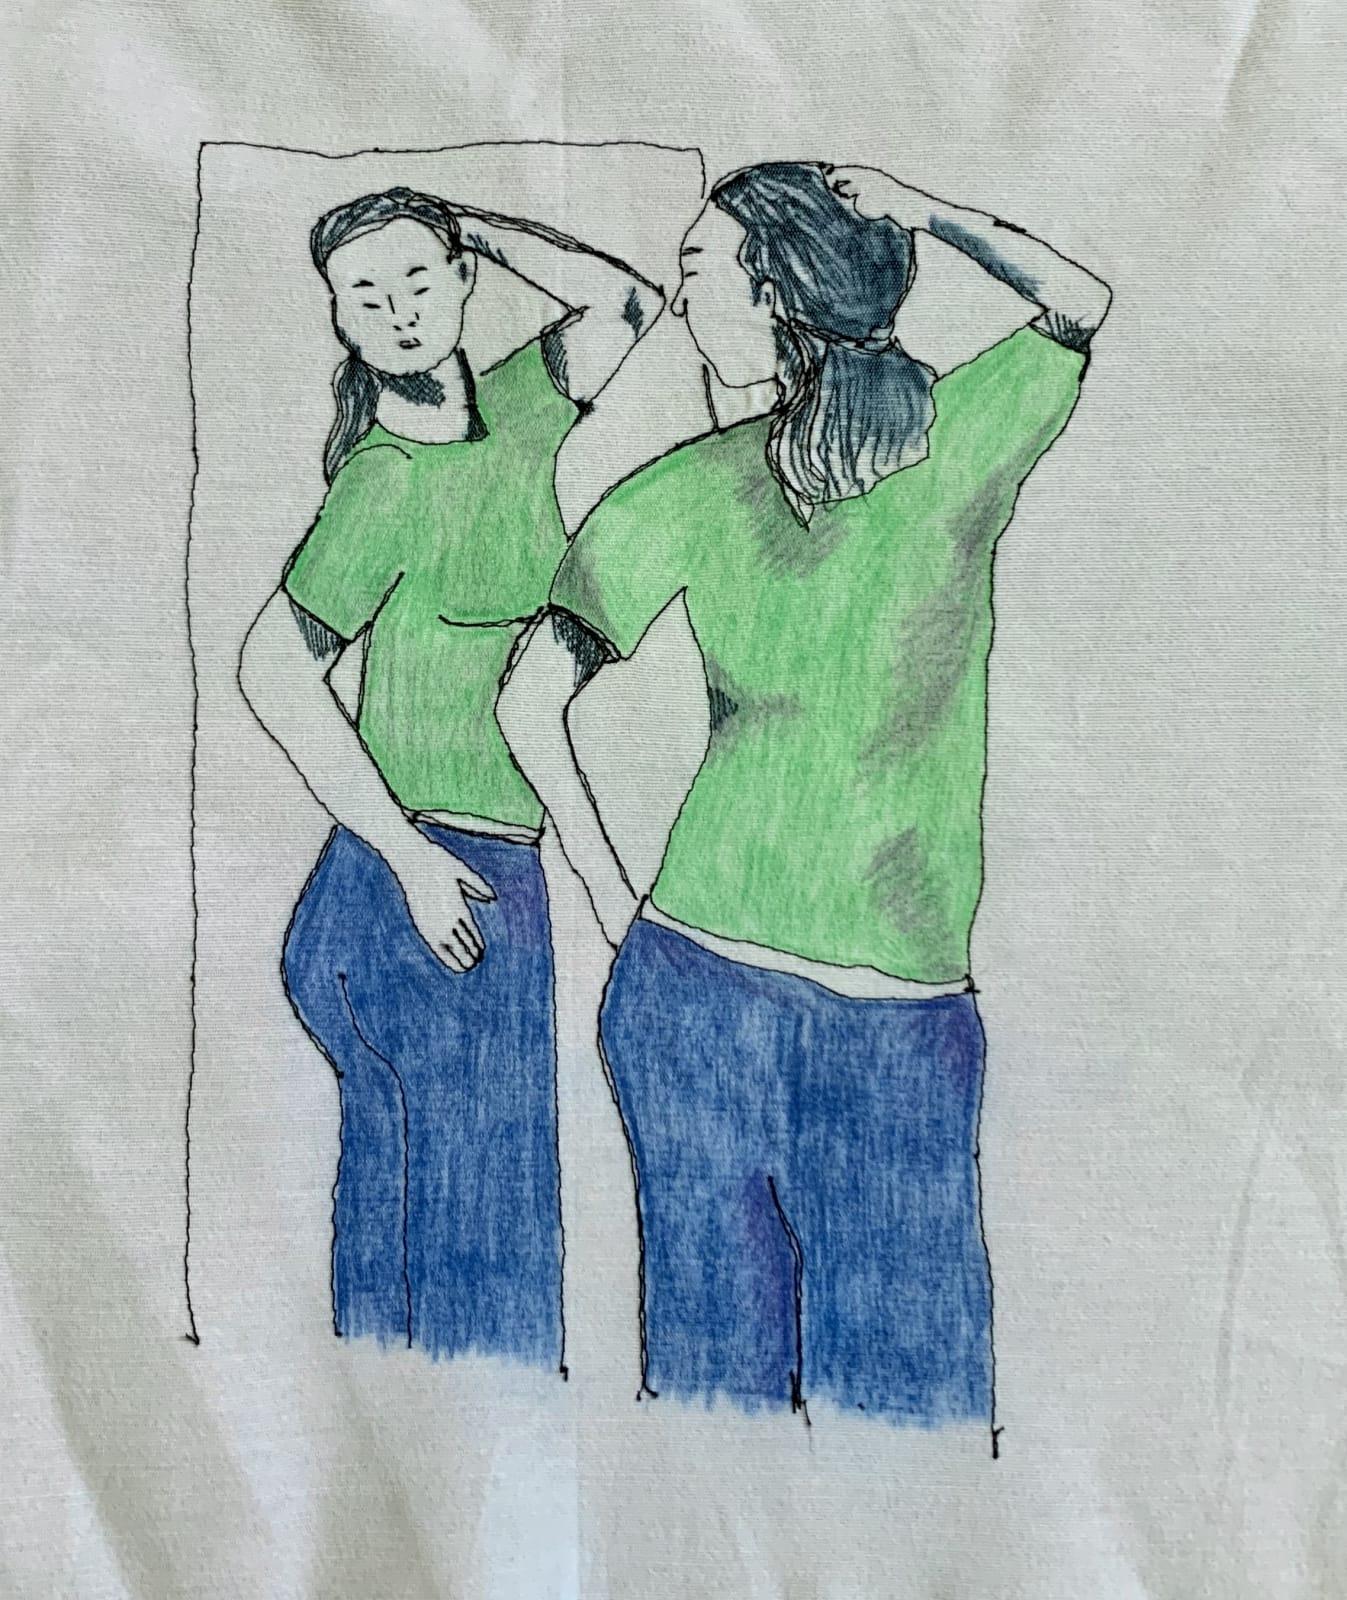 Natalia Schonowski, Mirror, Mirror, 2010